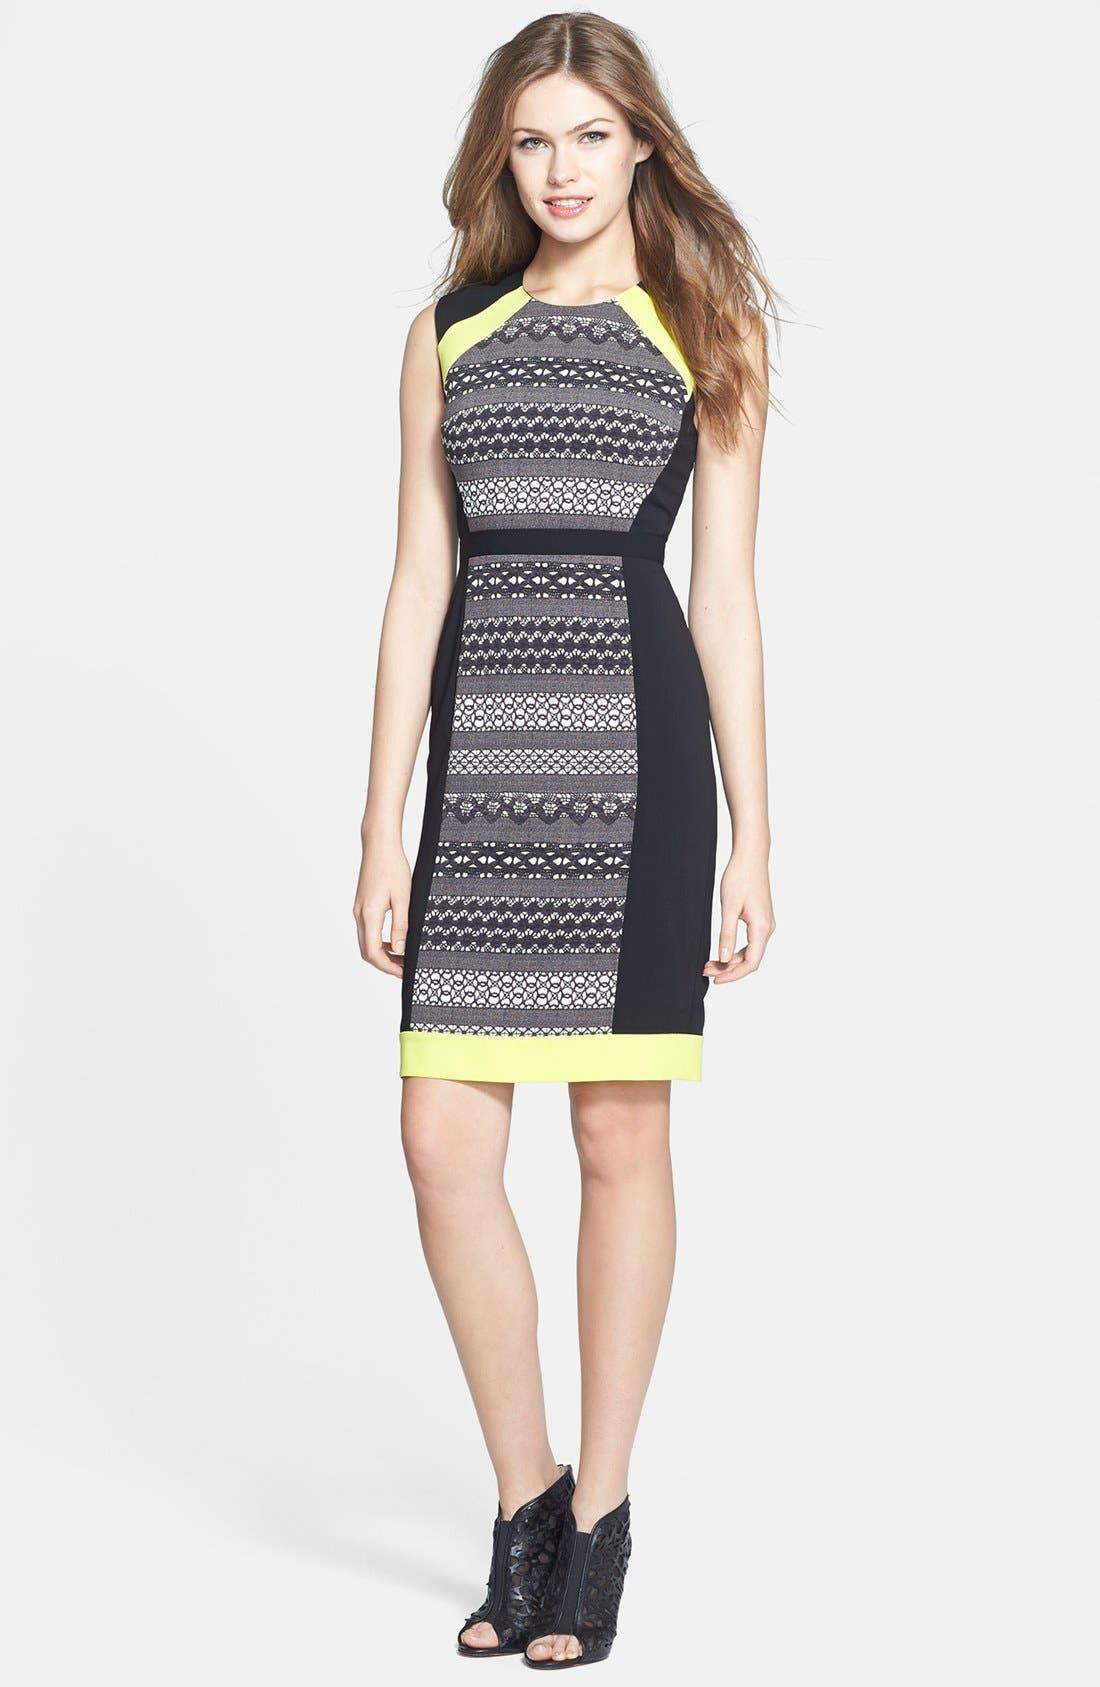 Alternate Image 1 Selected - BCBGMAXAZRIA 'Eileen' Stretch Crepe Sheath Dress